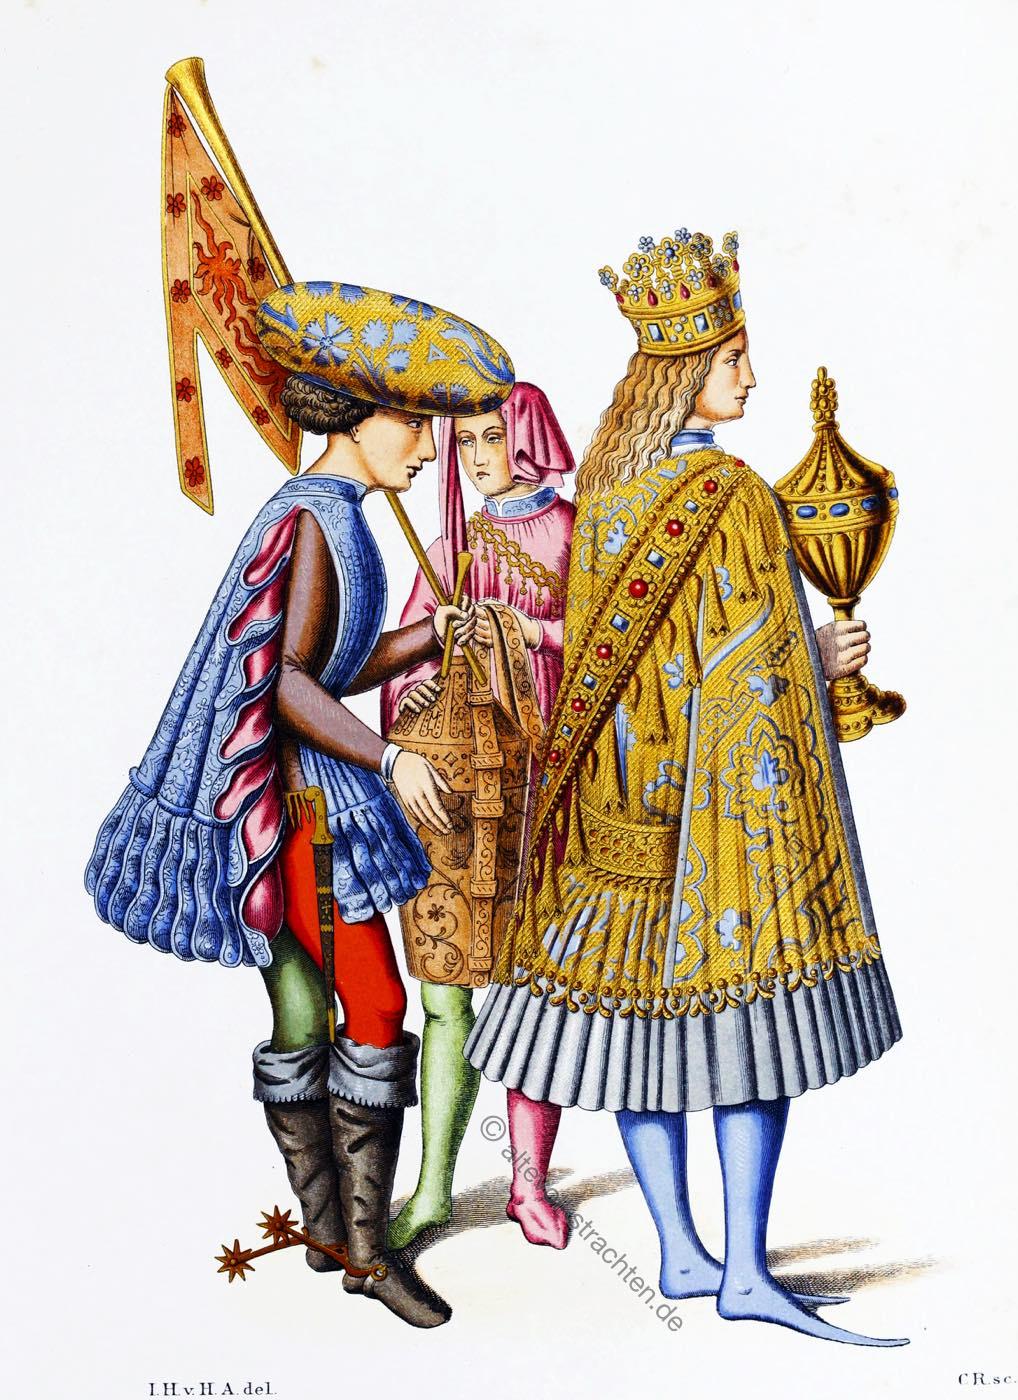 Italien, Hofstaat, Mode, Fürsten, Mittelalter, Renaissance, 15. Jahrhundert, Hefner-Alteneck,